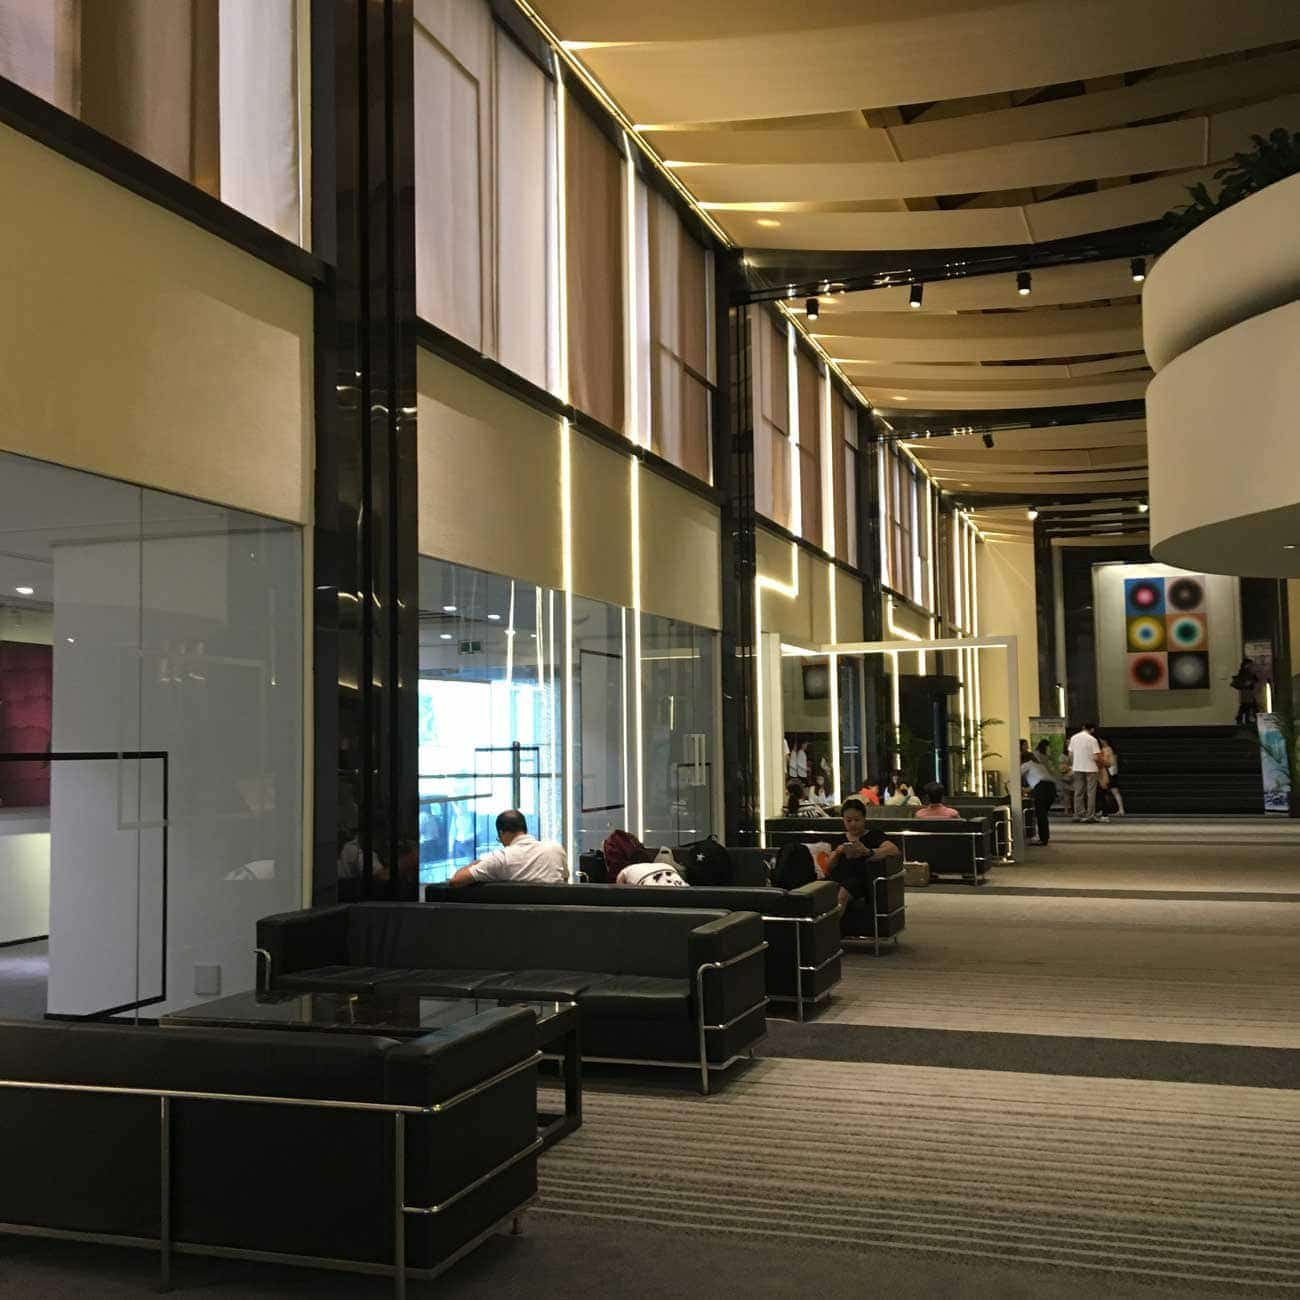 Regency Art Hotel lobby